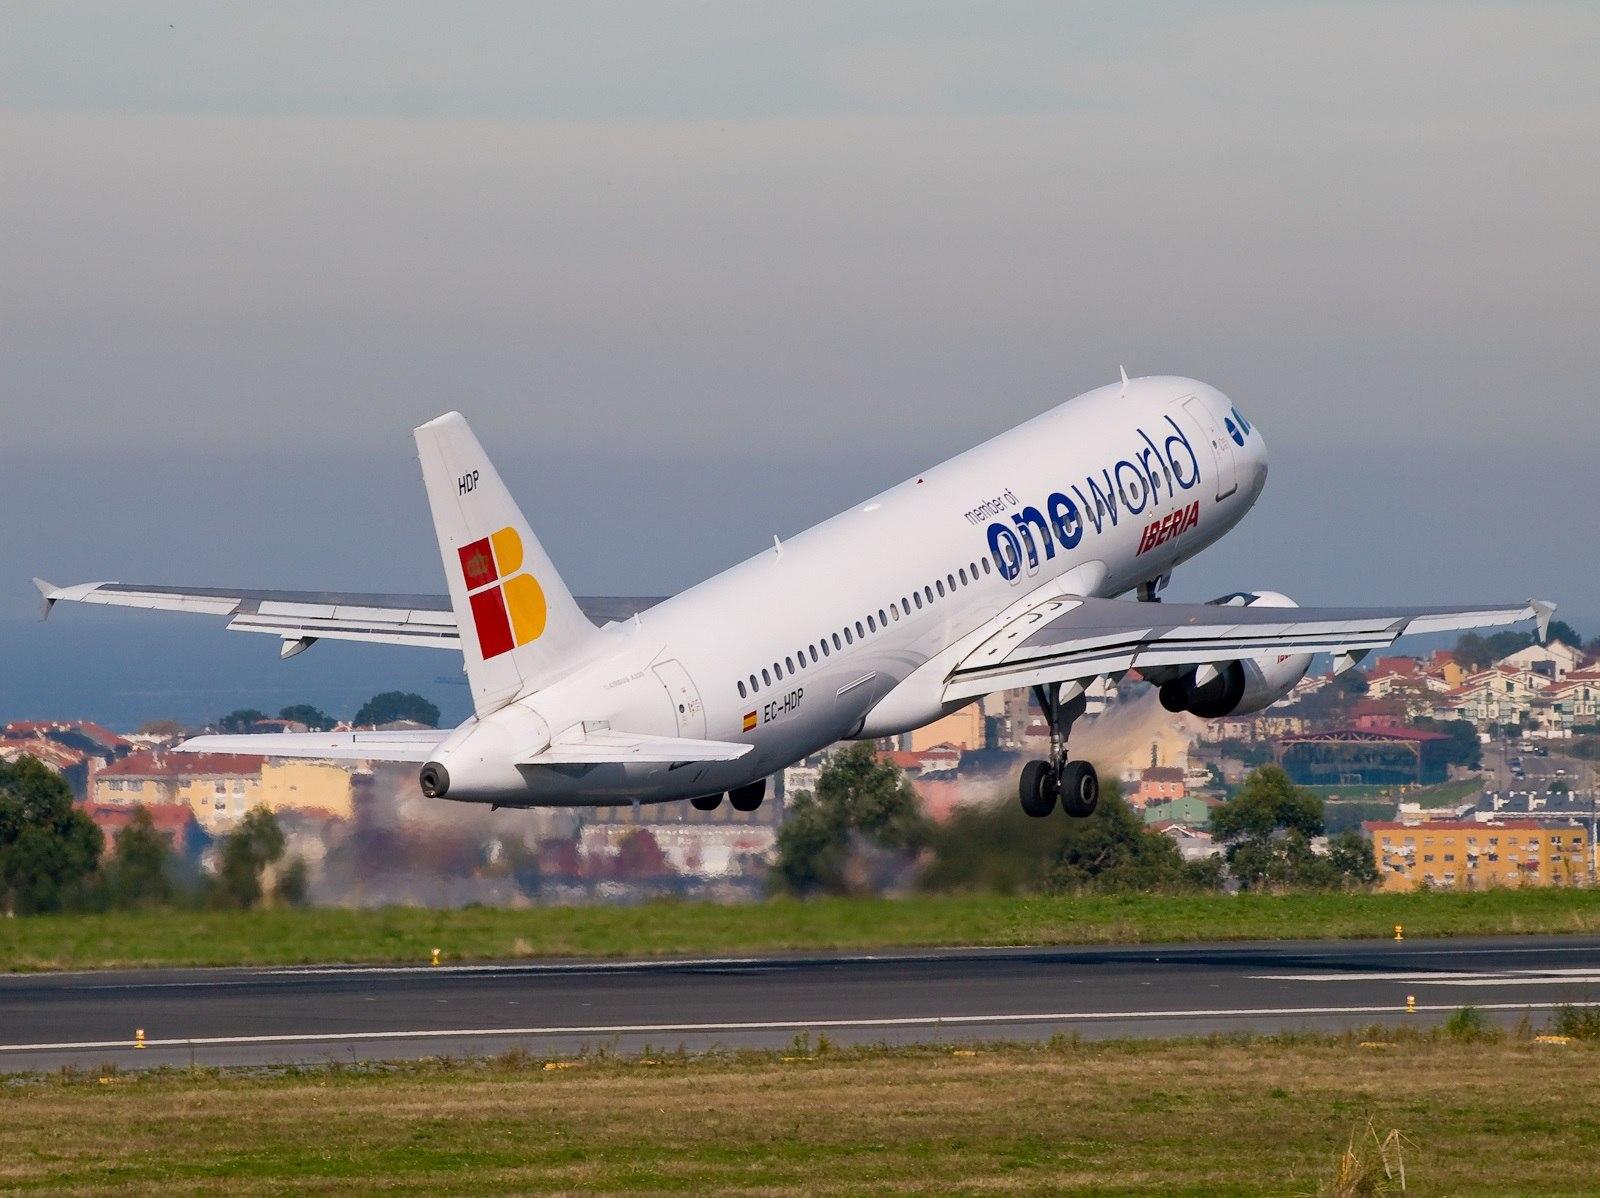 Лайнер авиакомпании Iberia в ливрее oneworld